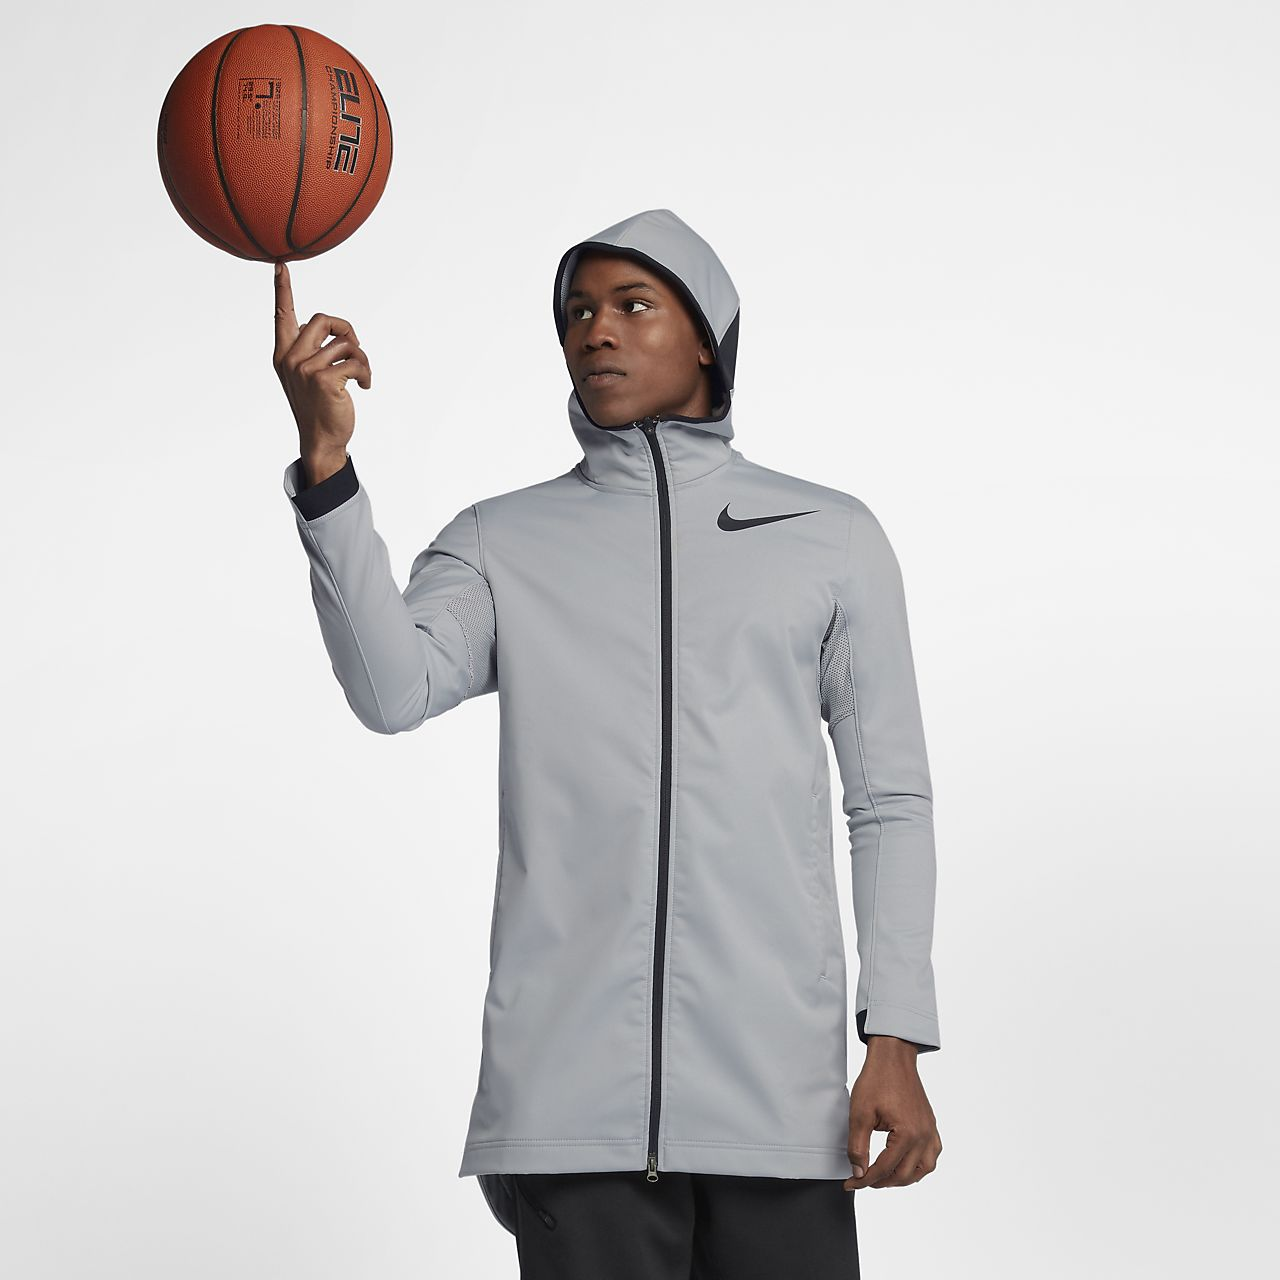 Hombre Chaqueta Para De Básquetbol Nike Protect PZiXuk